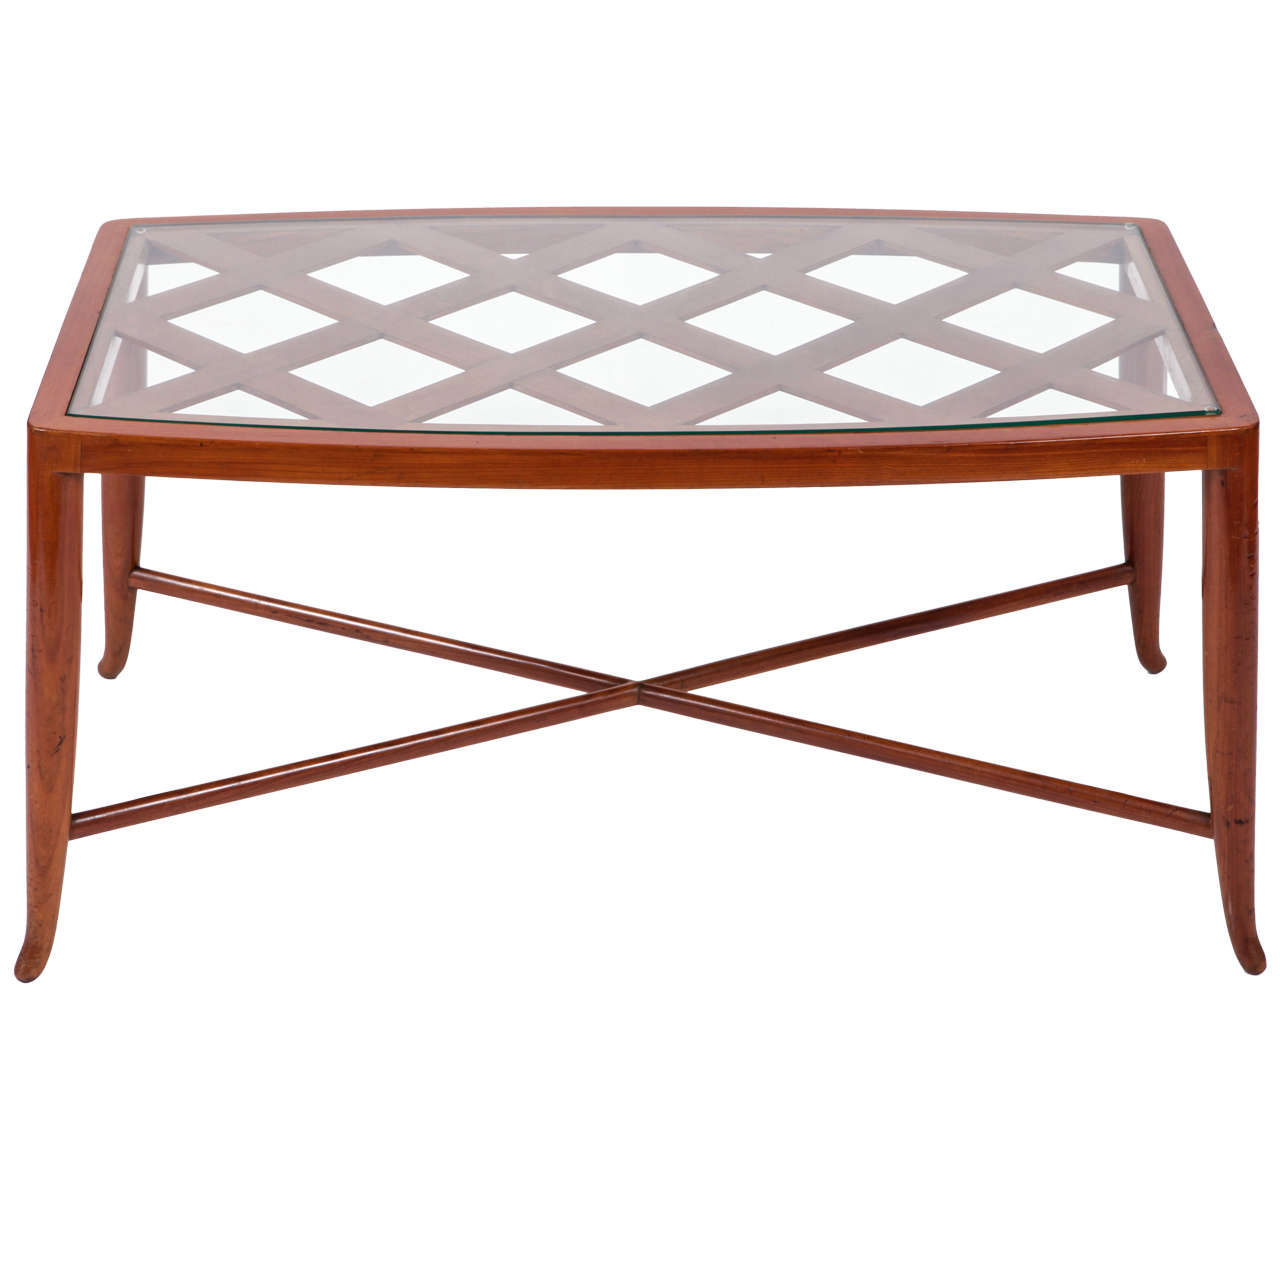 Rare Paolo Buffa Coffee Table